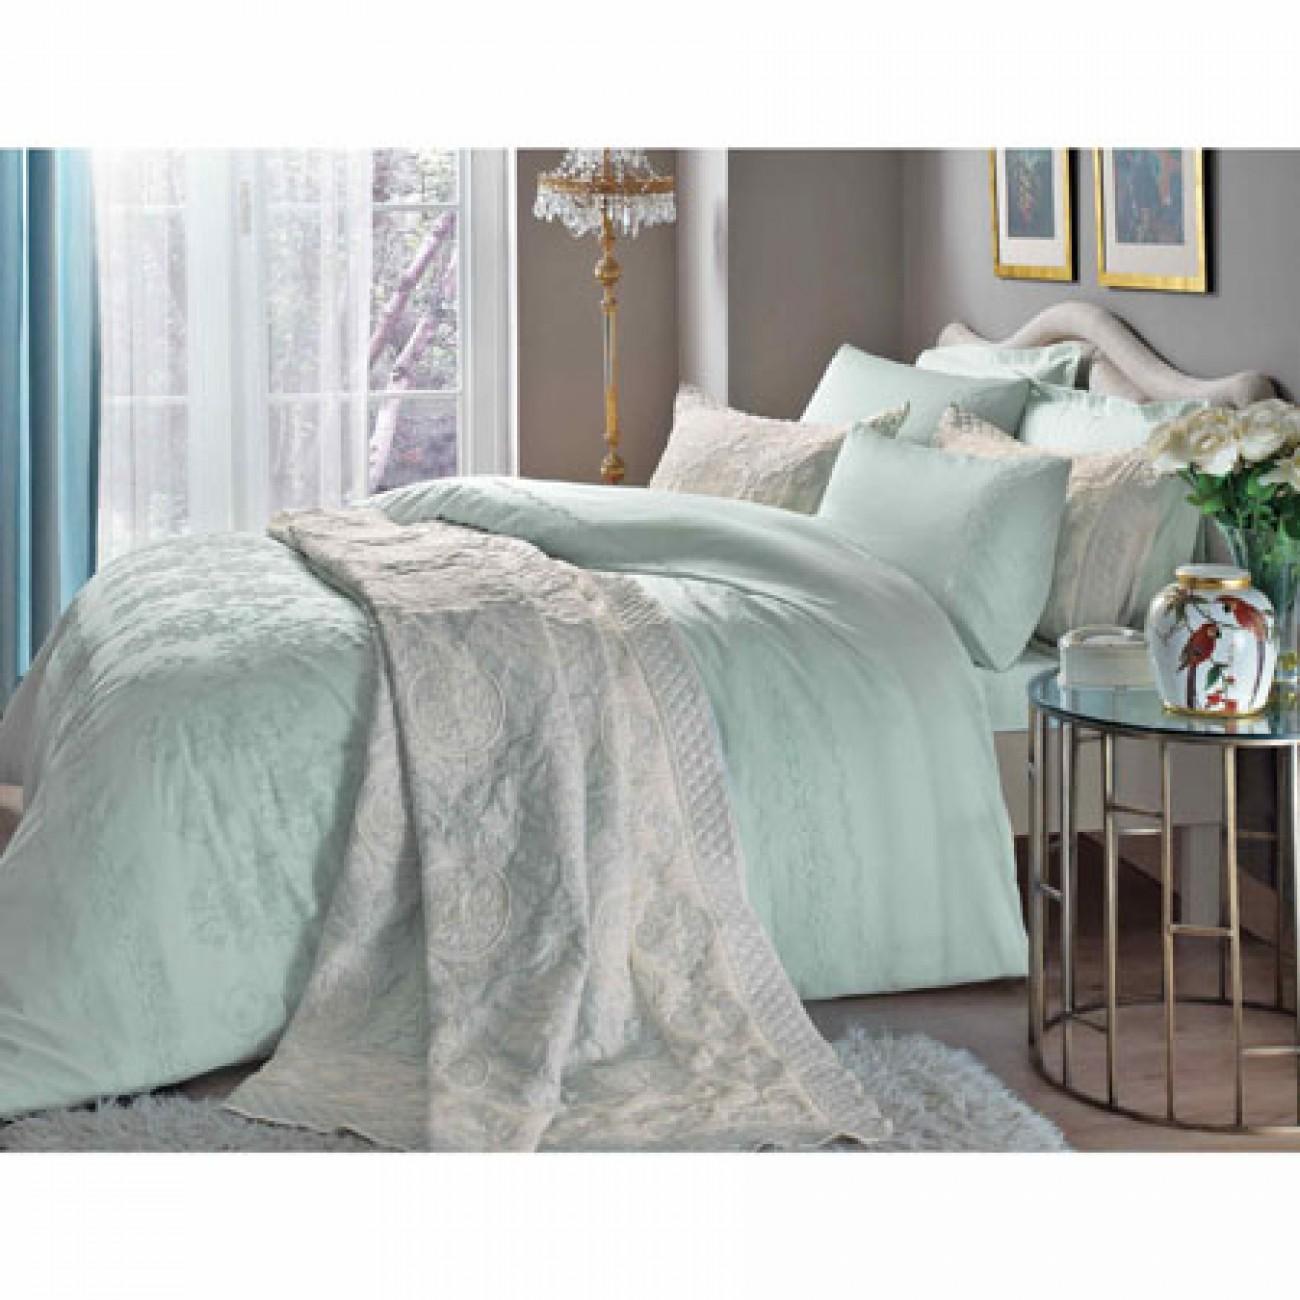 tagesdeckentac anette 250x240 jakar tagesdecken set mint. Black Bedroom Furniture Sets. Home Design Ideas